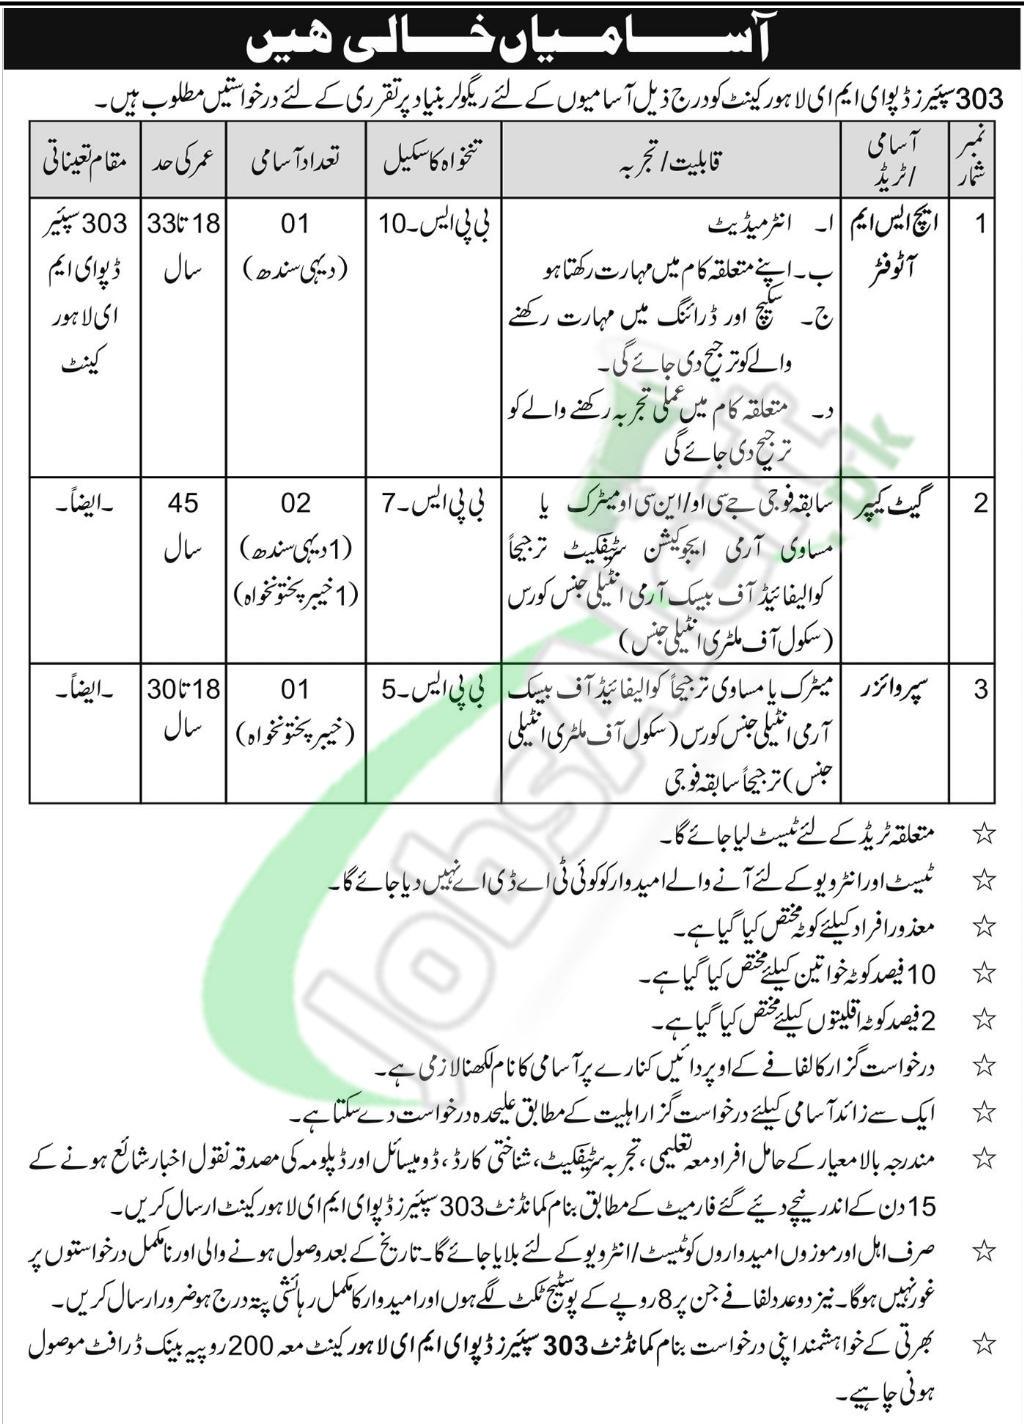 303 Spares Depot EME Lahore Jobs 2018 Application Form